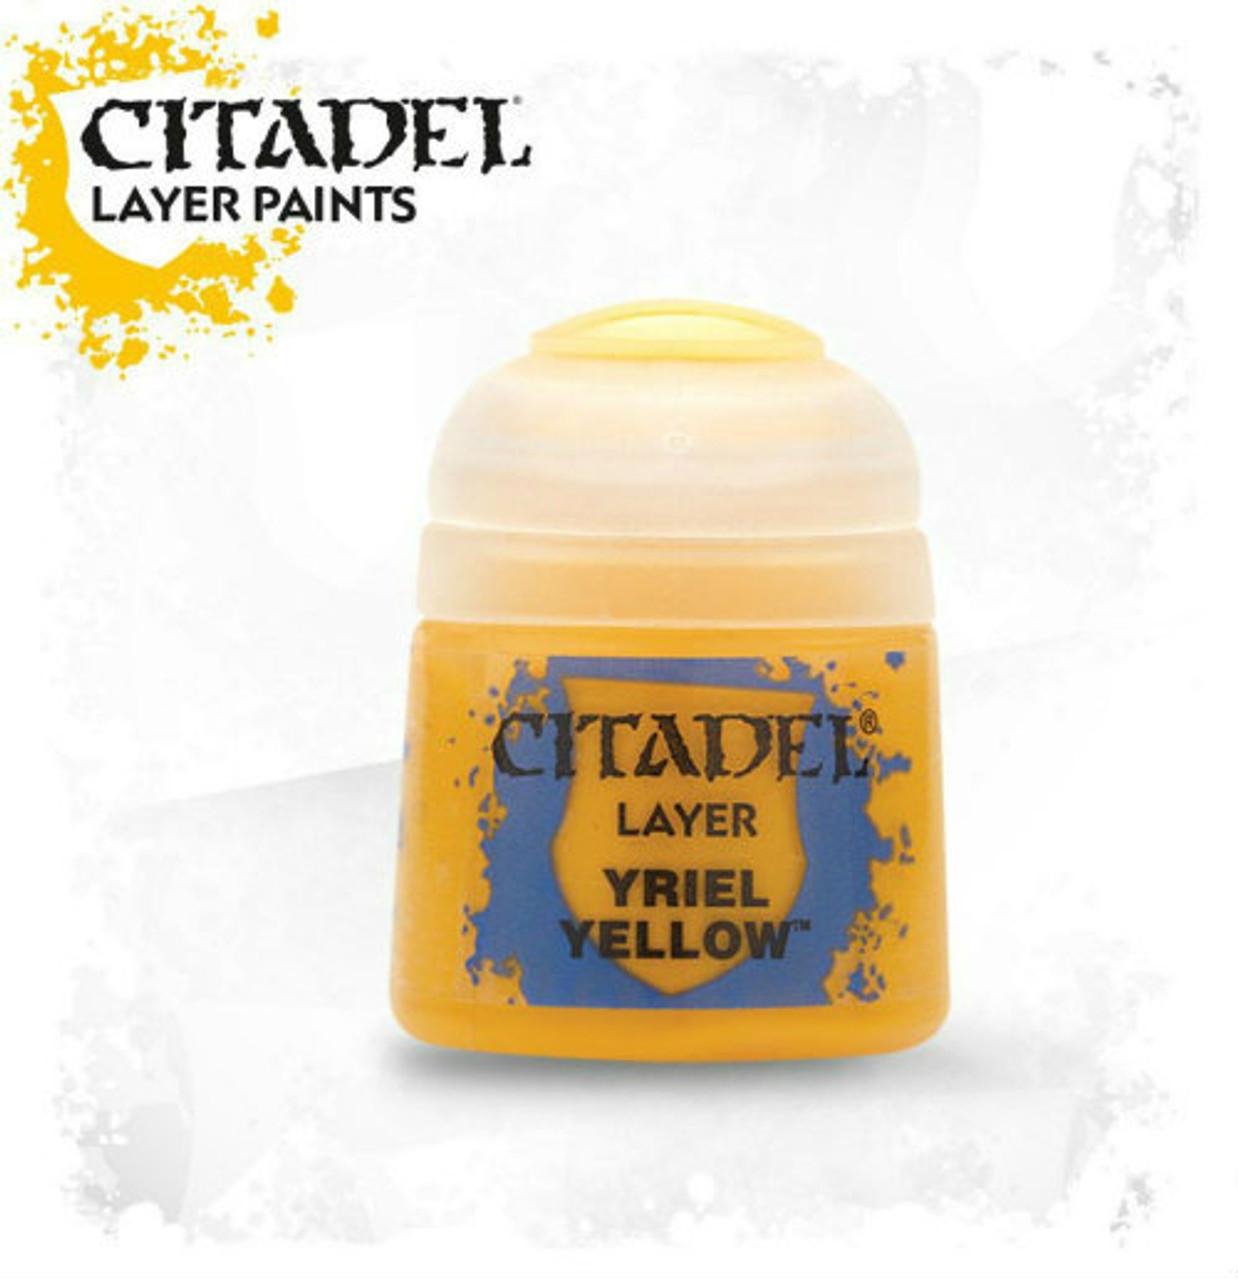 Citadel: Layer Paint - Yriel Yellow (12ml)